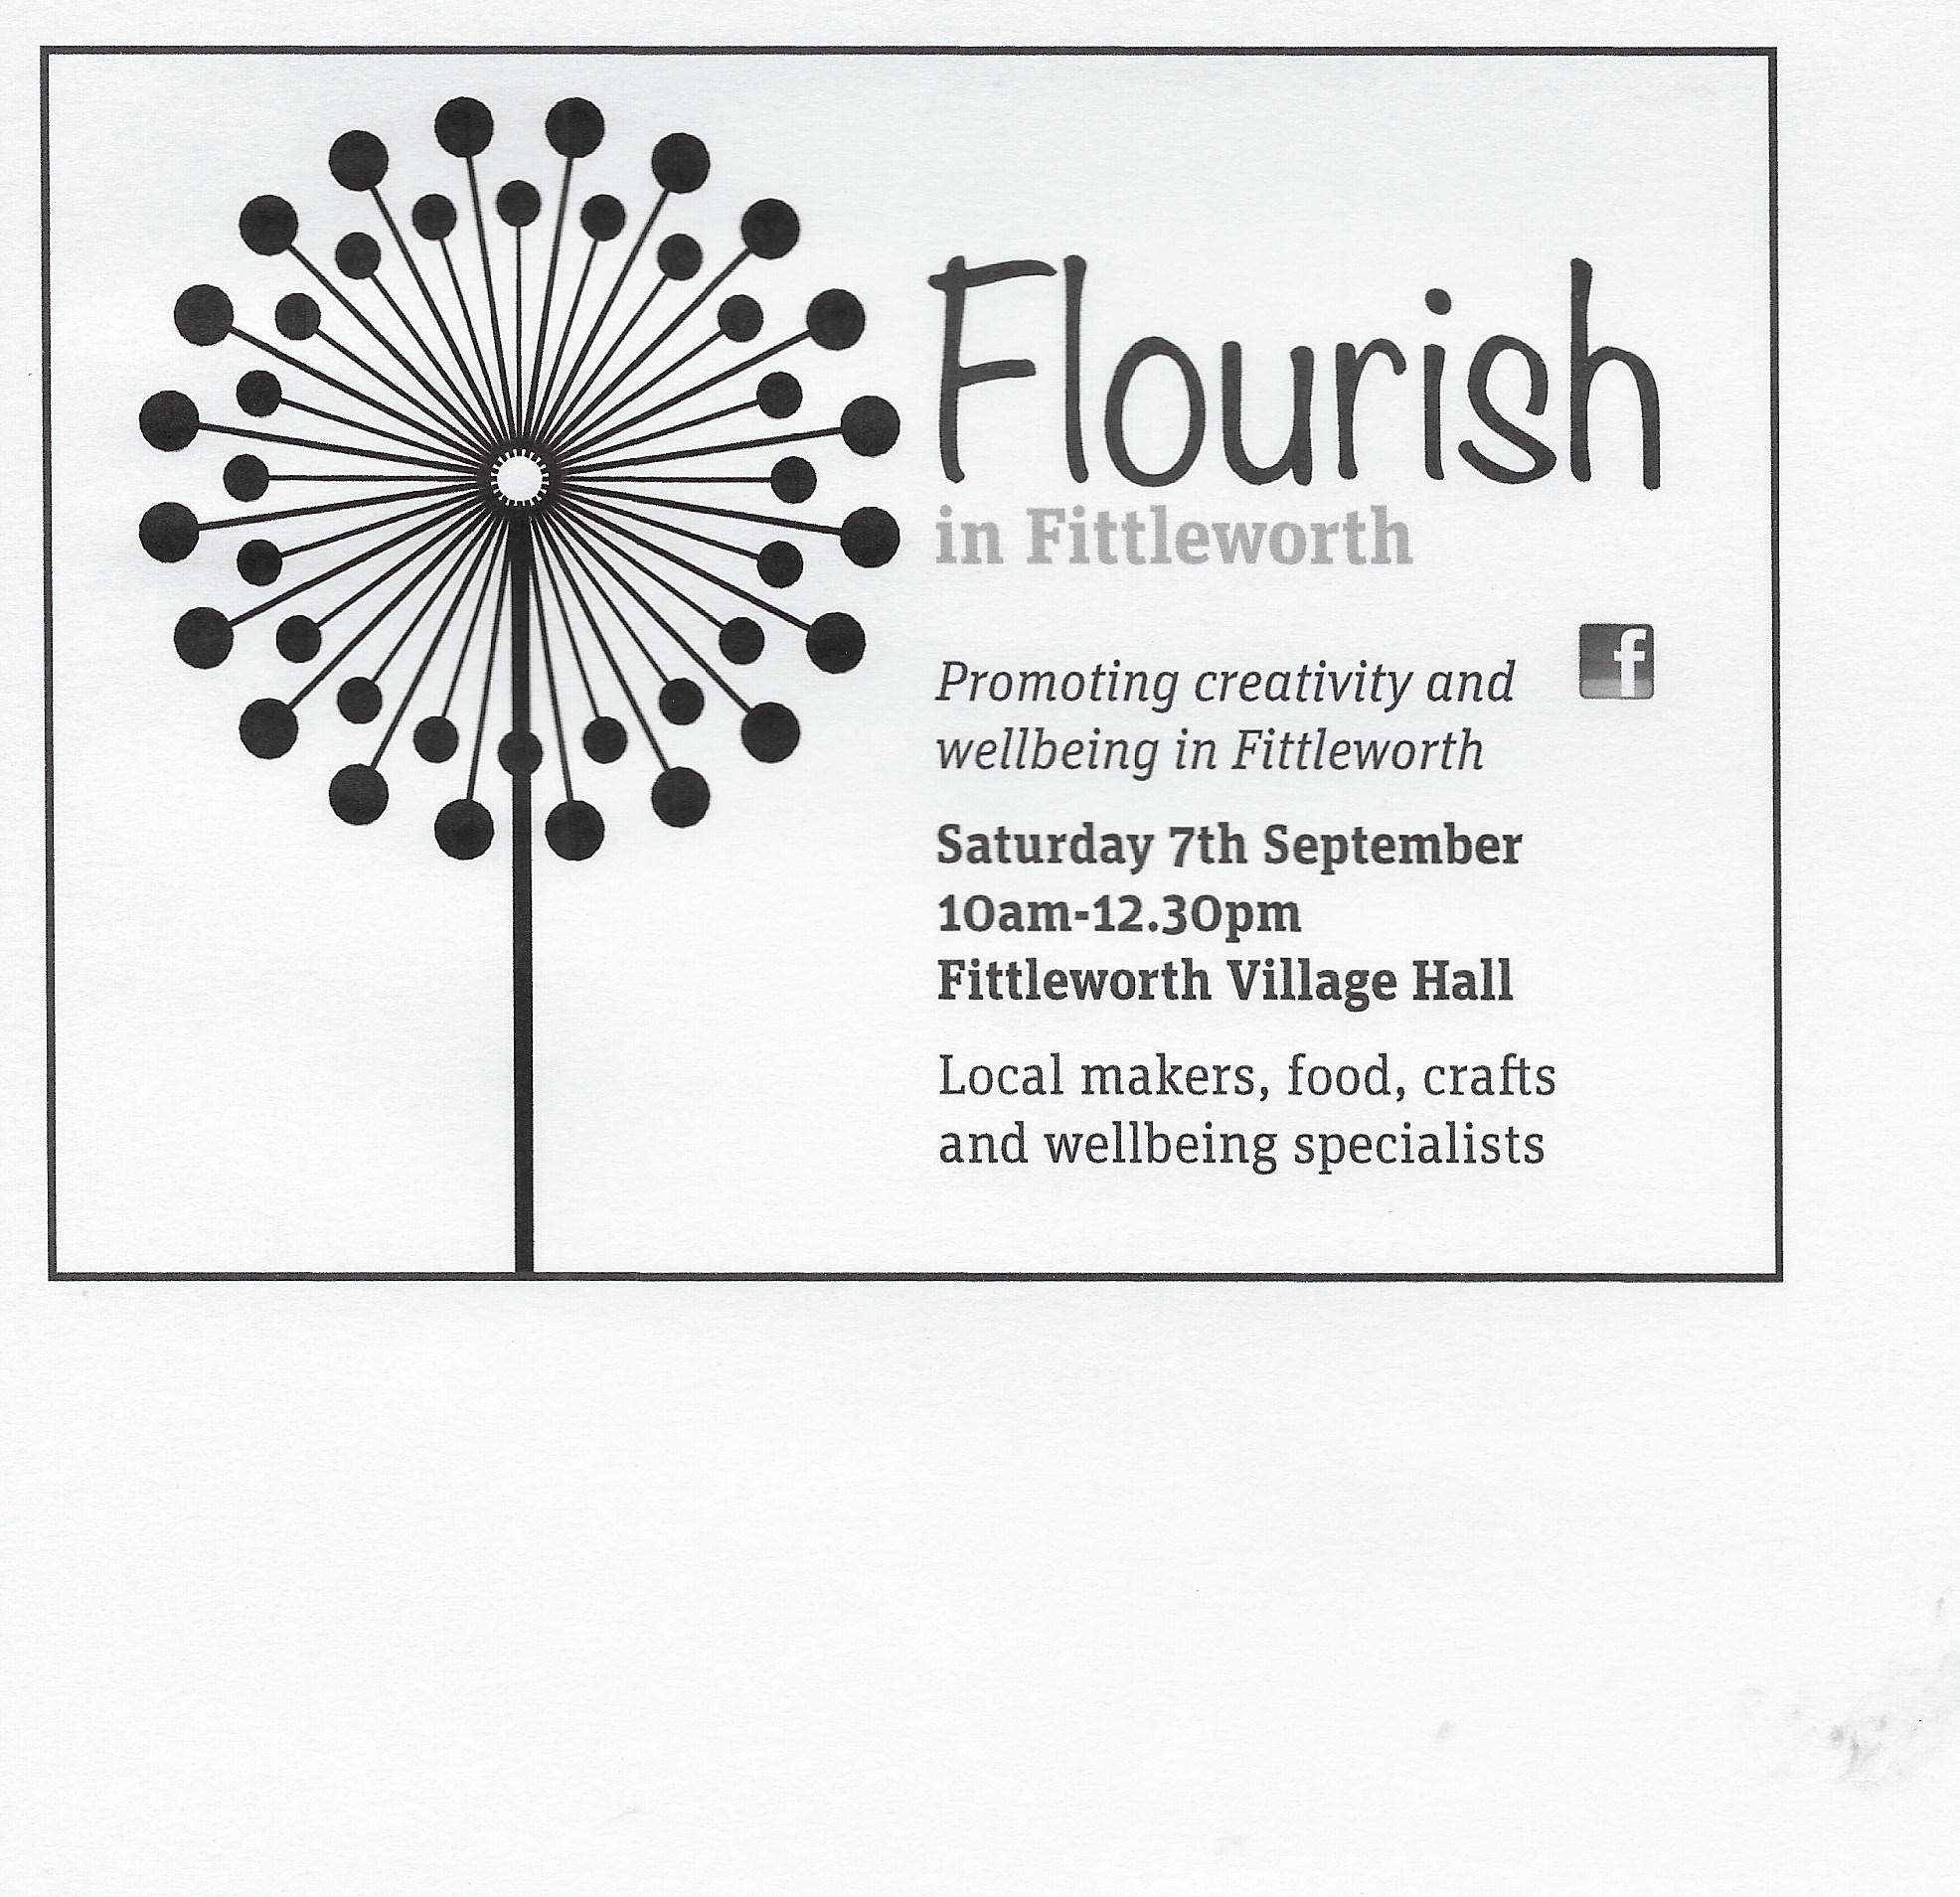 Flourish in Fittleworth